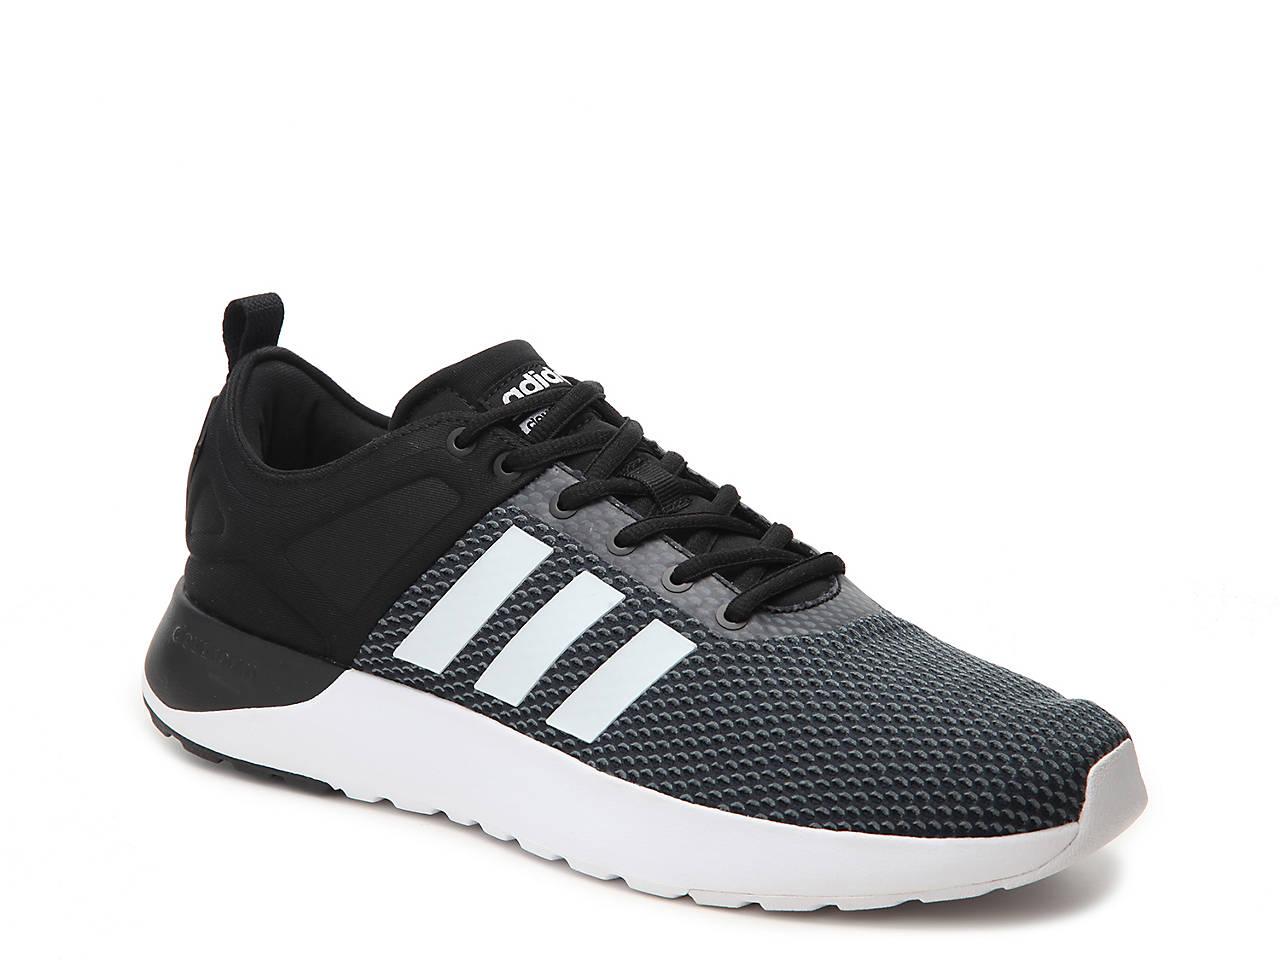 adidas super racer scarpe uomini scarpe da uomo dsw